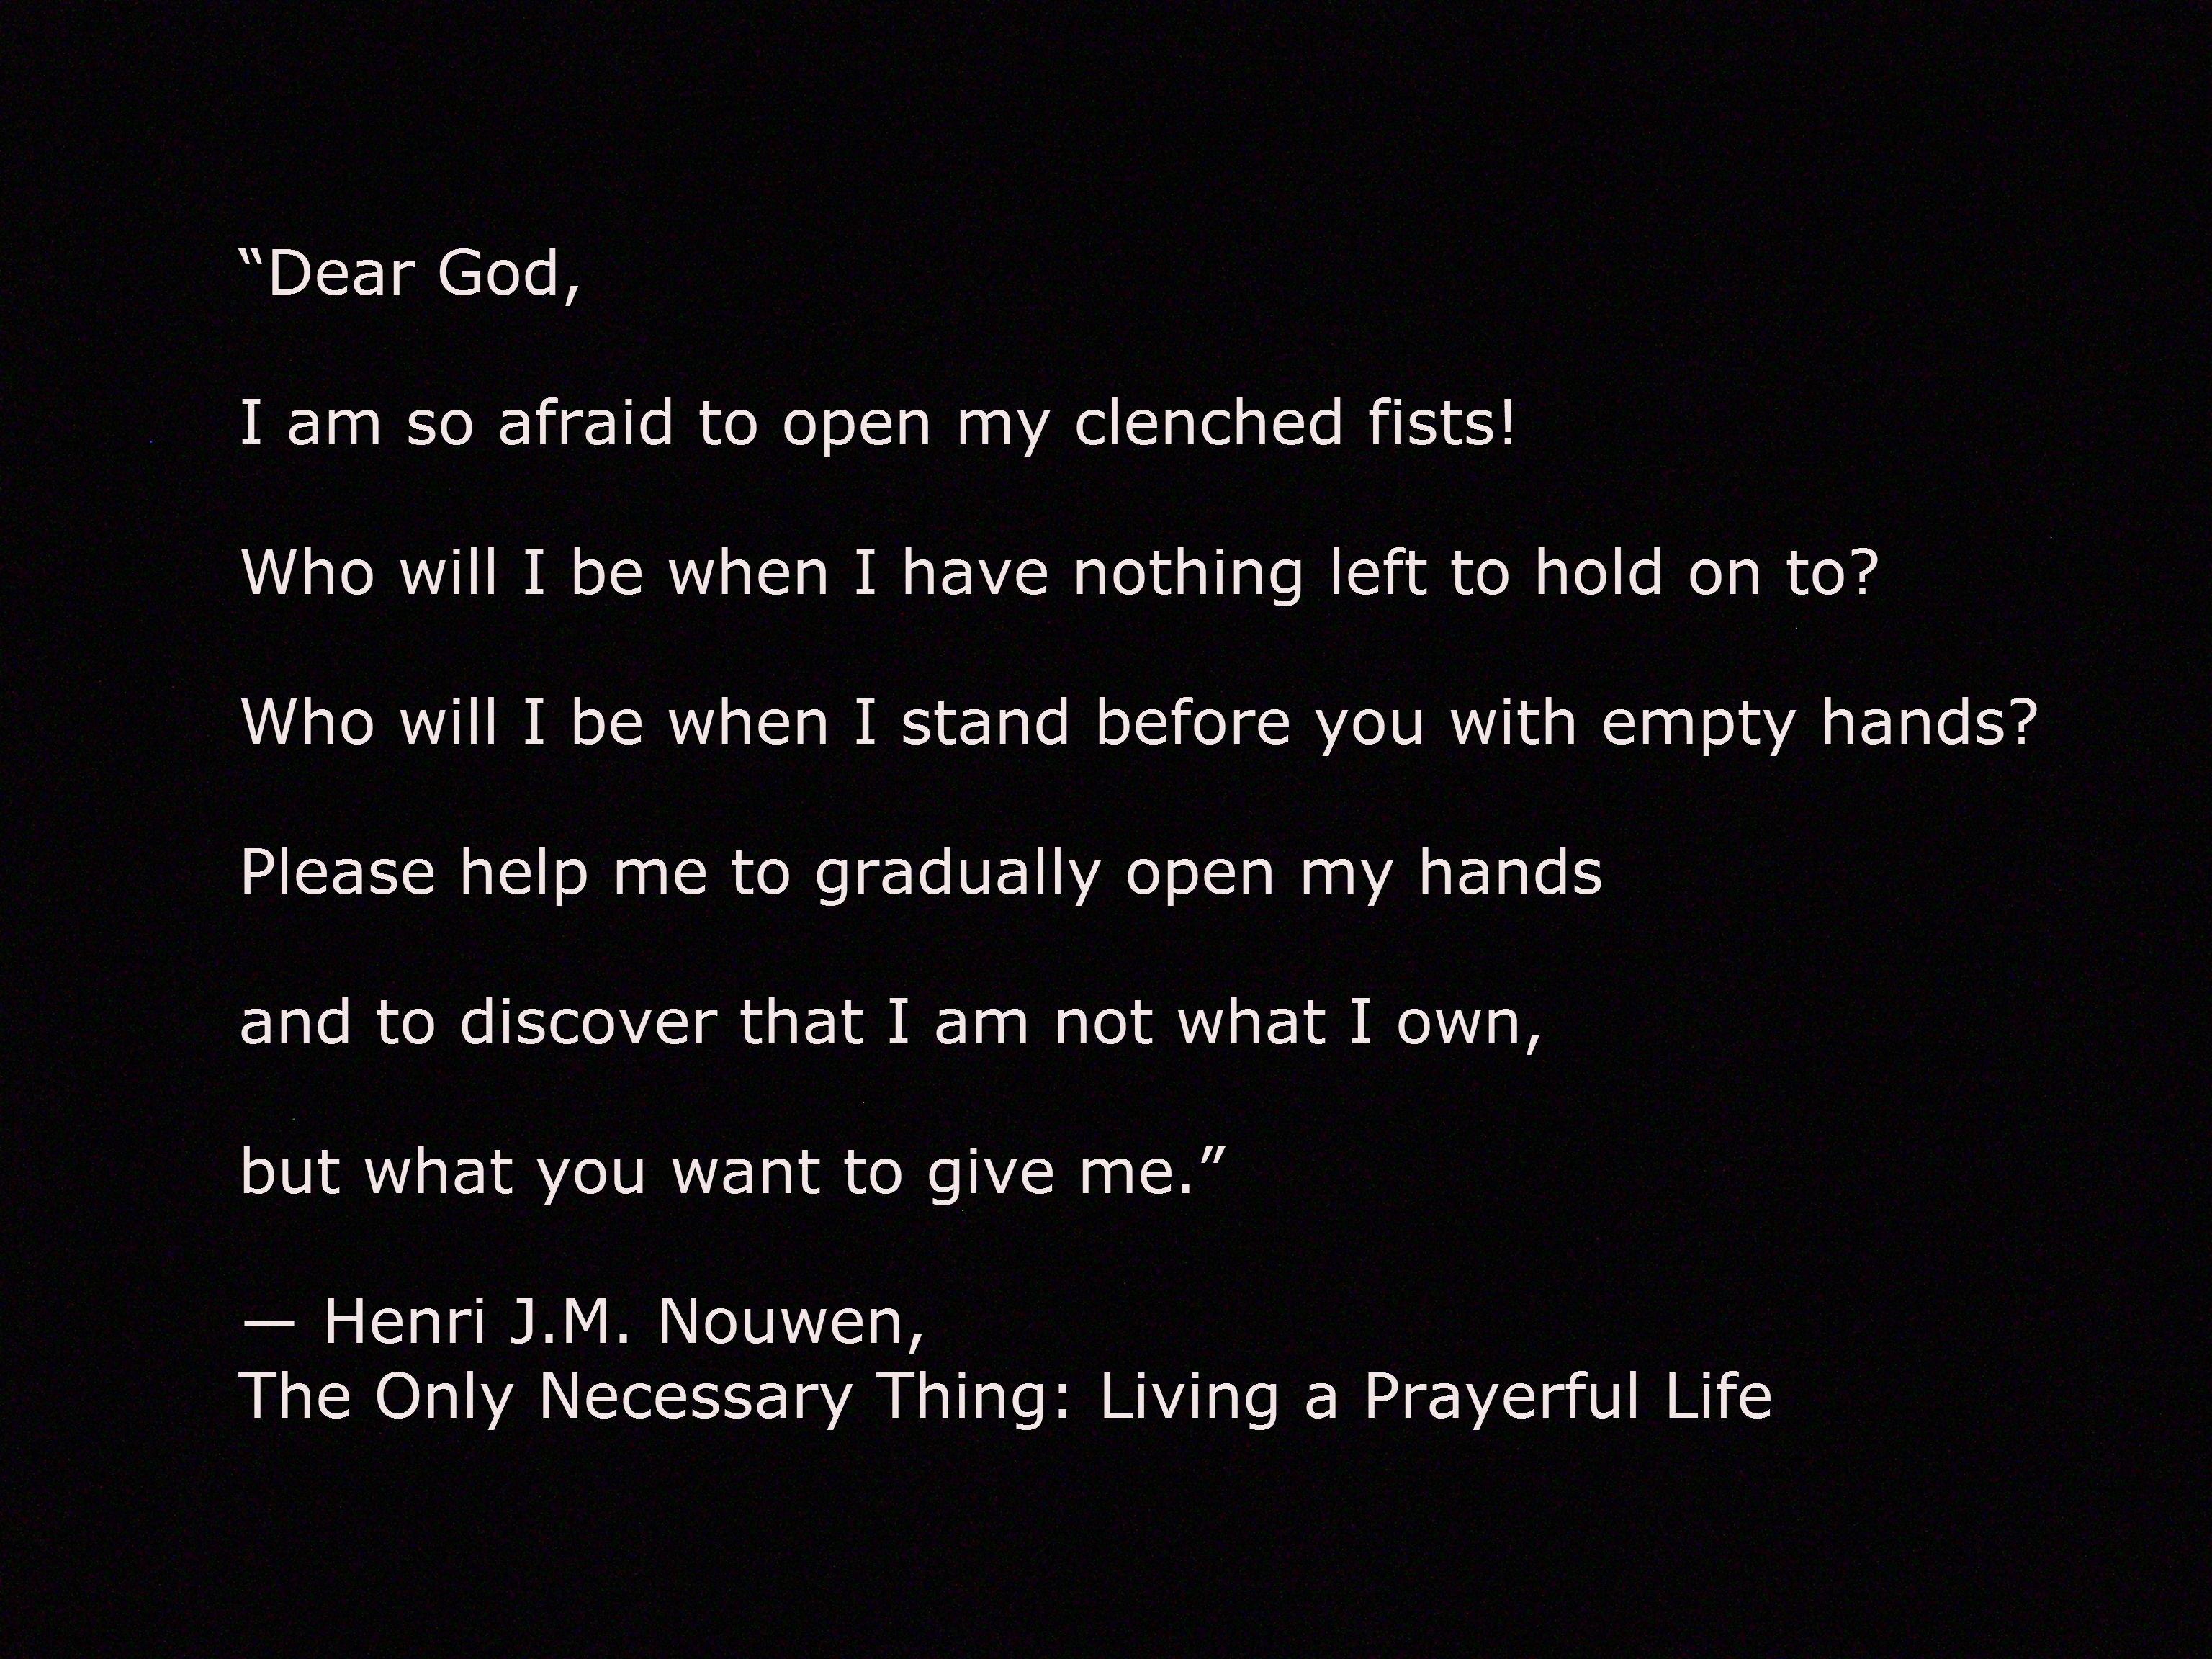 Henri Nouwen's quote #2